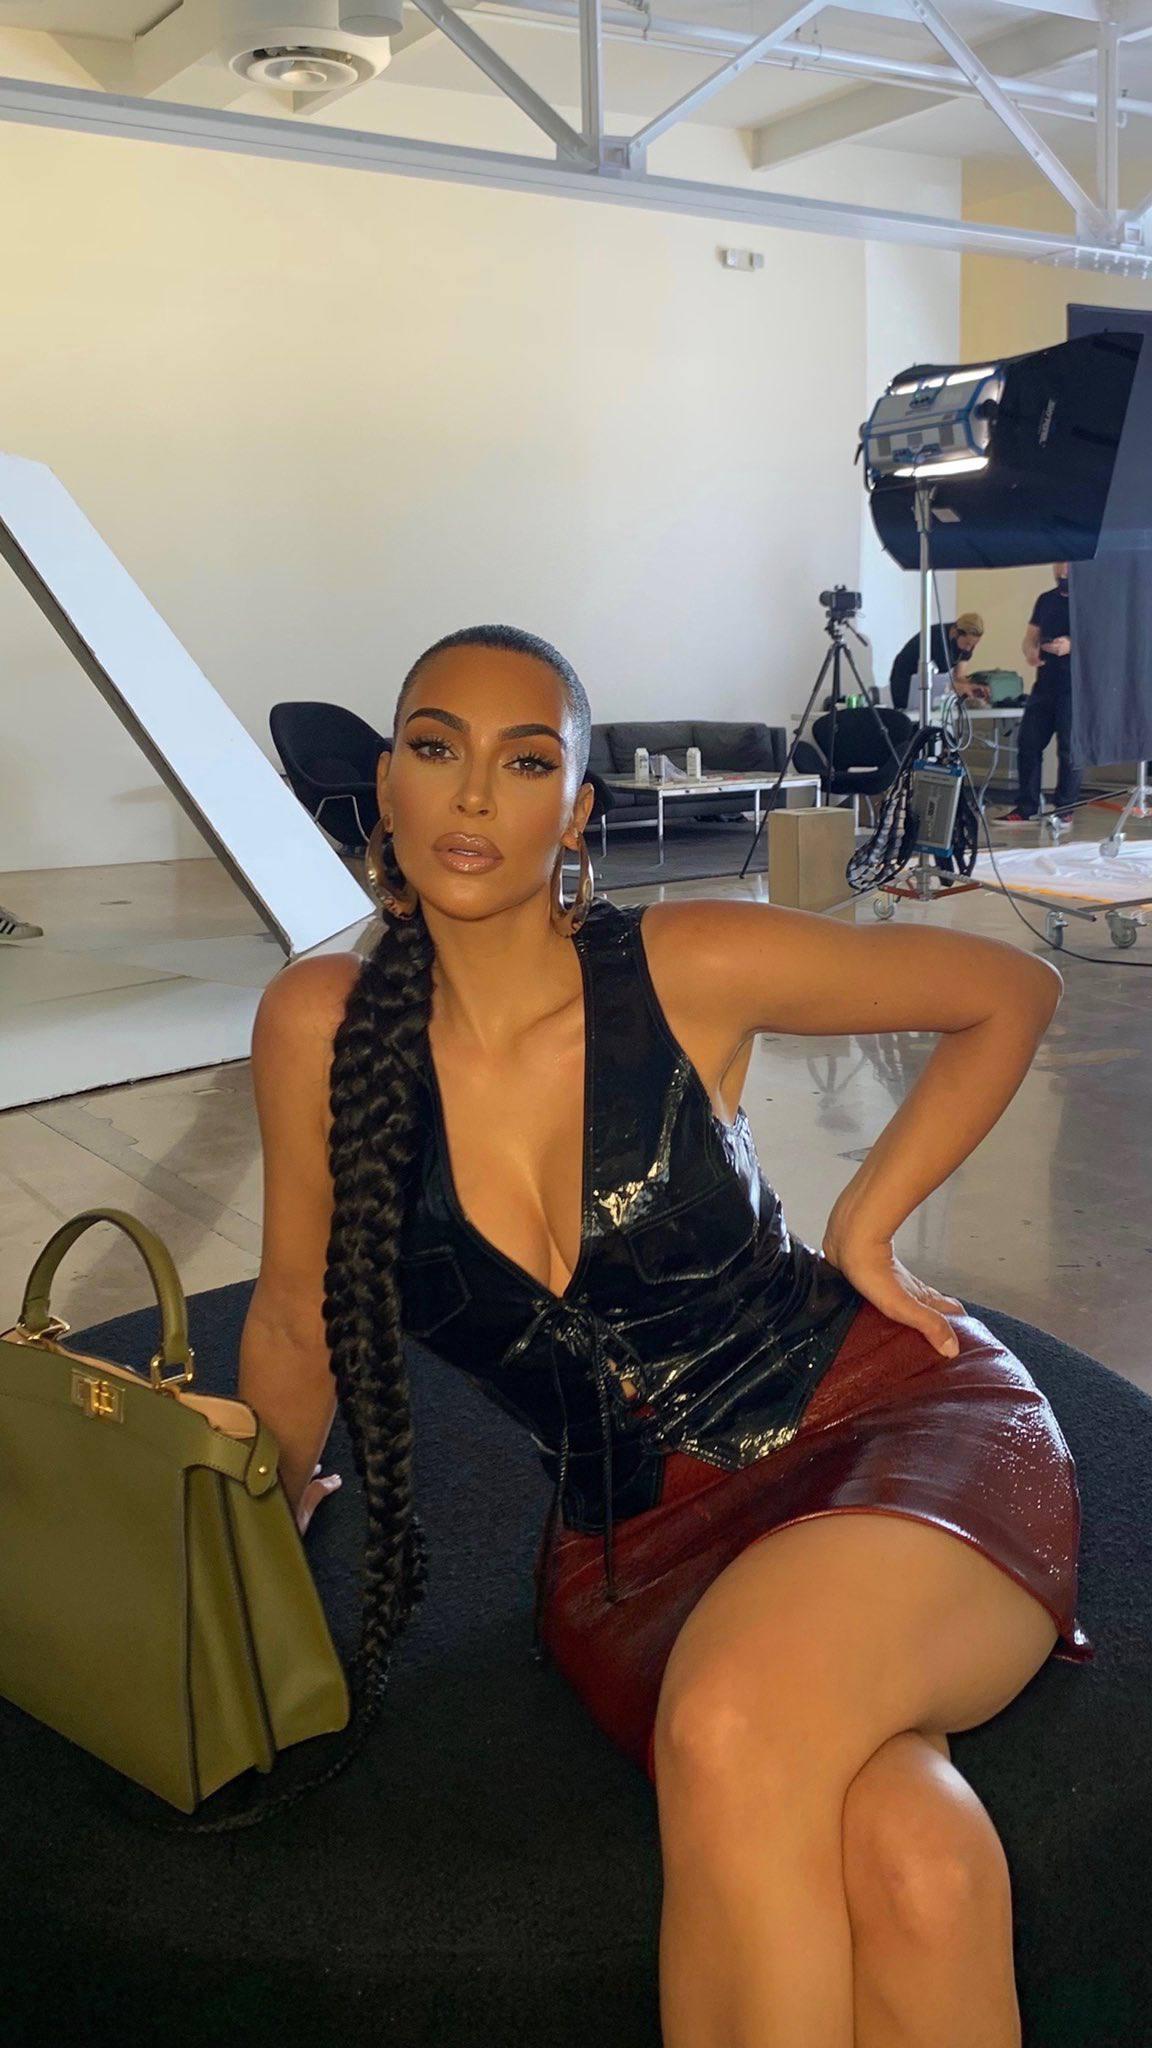 Kim Kardashian Leggy And Cleavagy